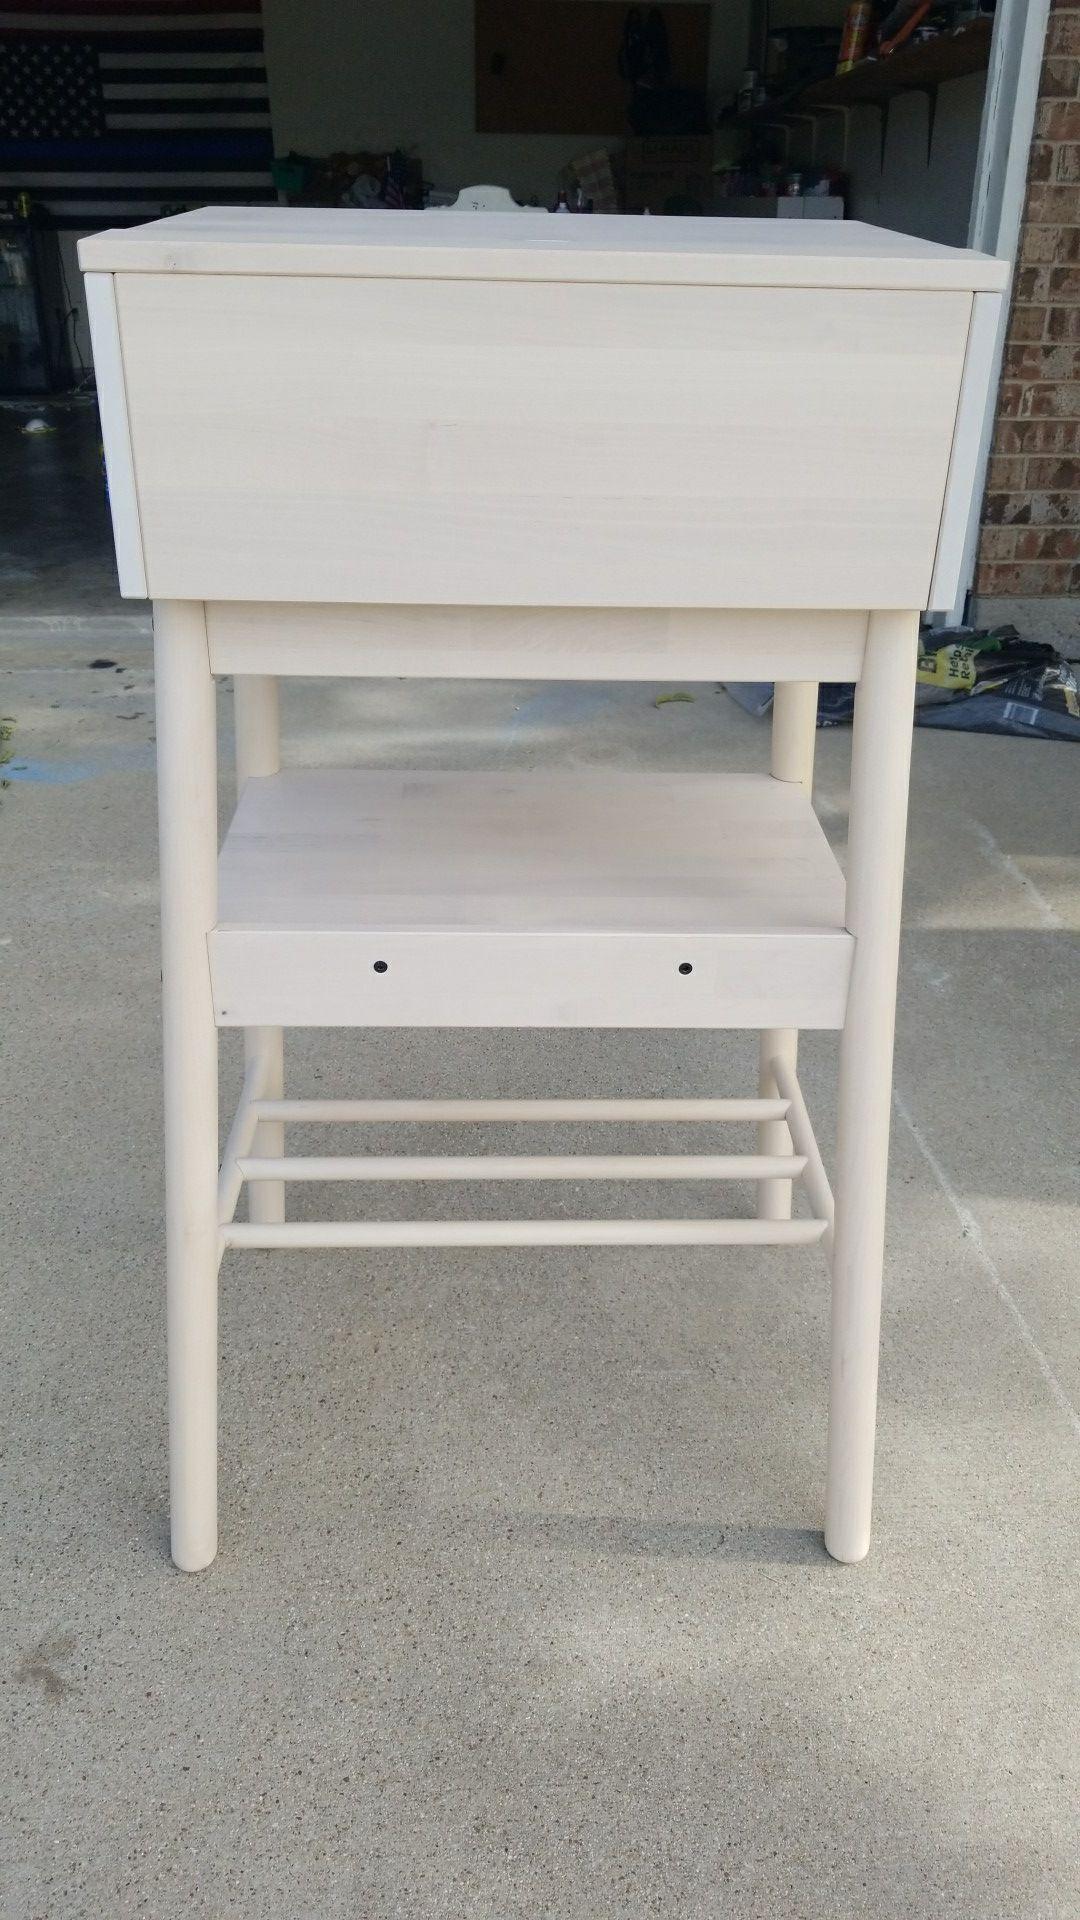 Wood Bar Height Mail Organizer or Minimalist Desk. Ikea Knotten Desk